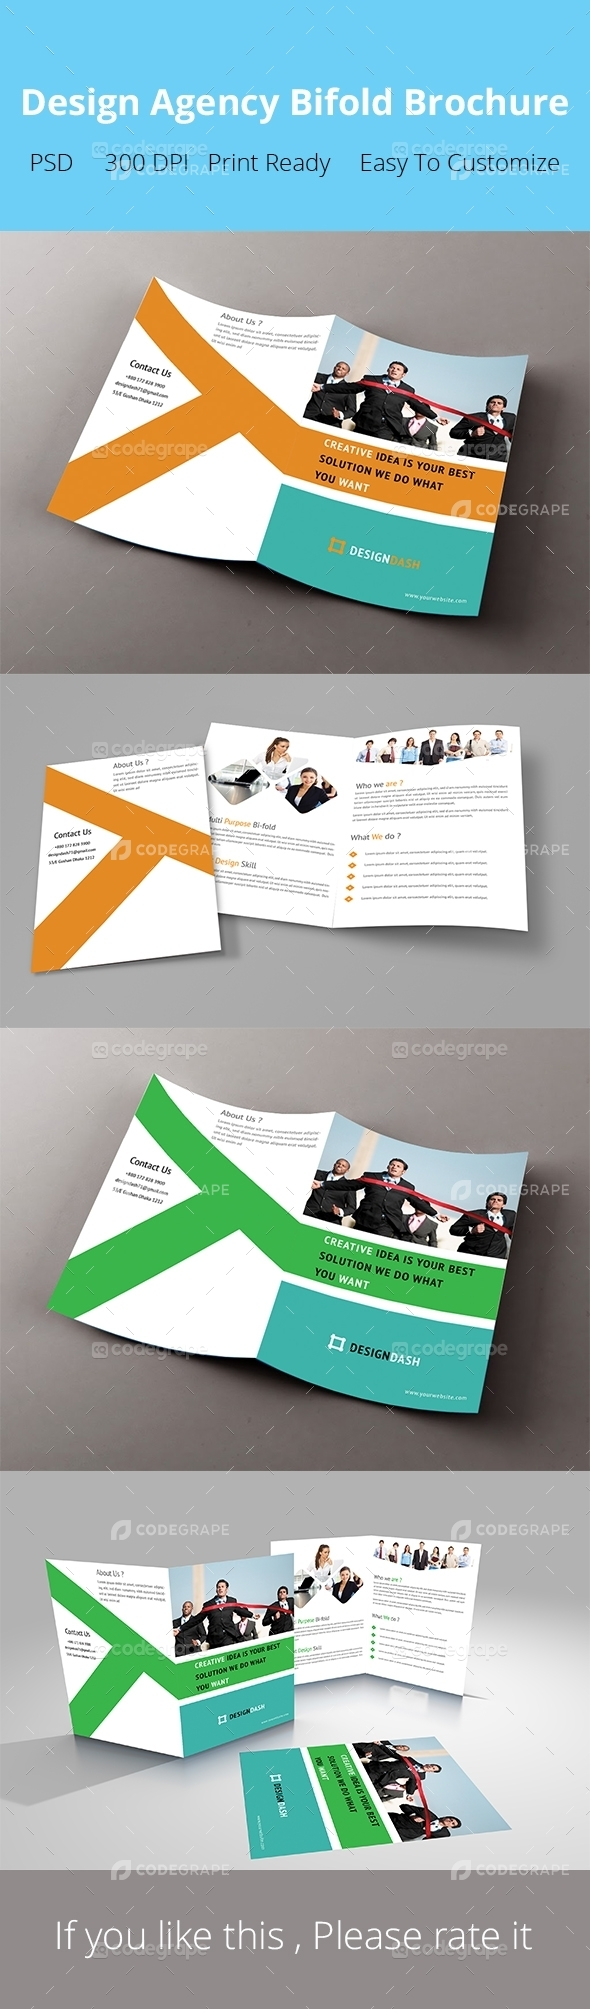 Design Agency Bifold Brochure